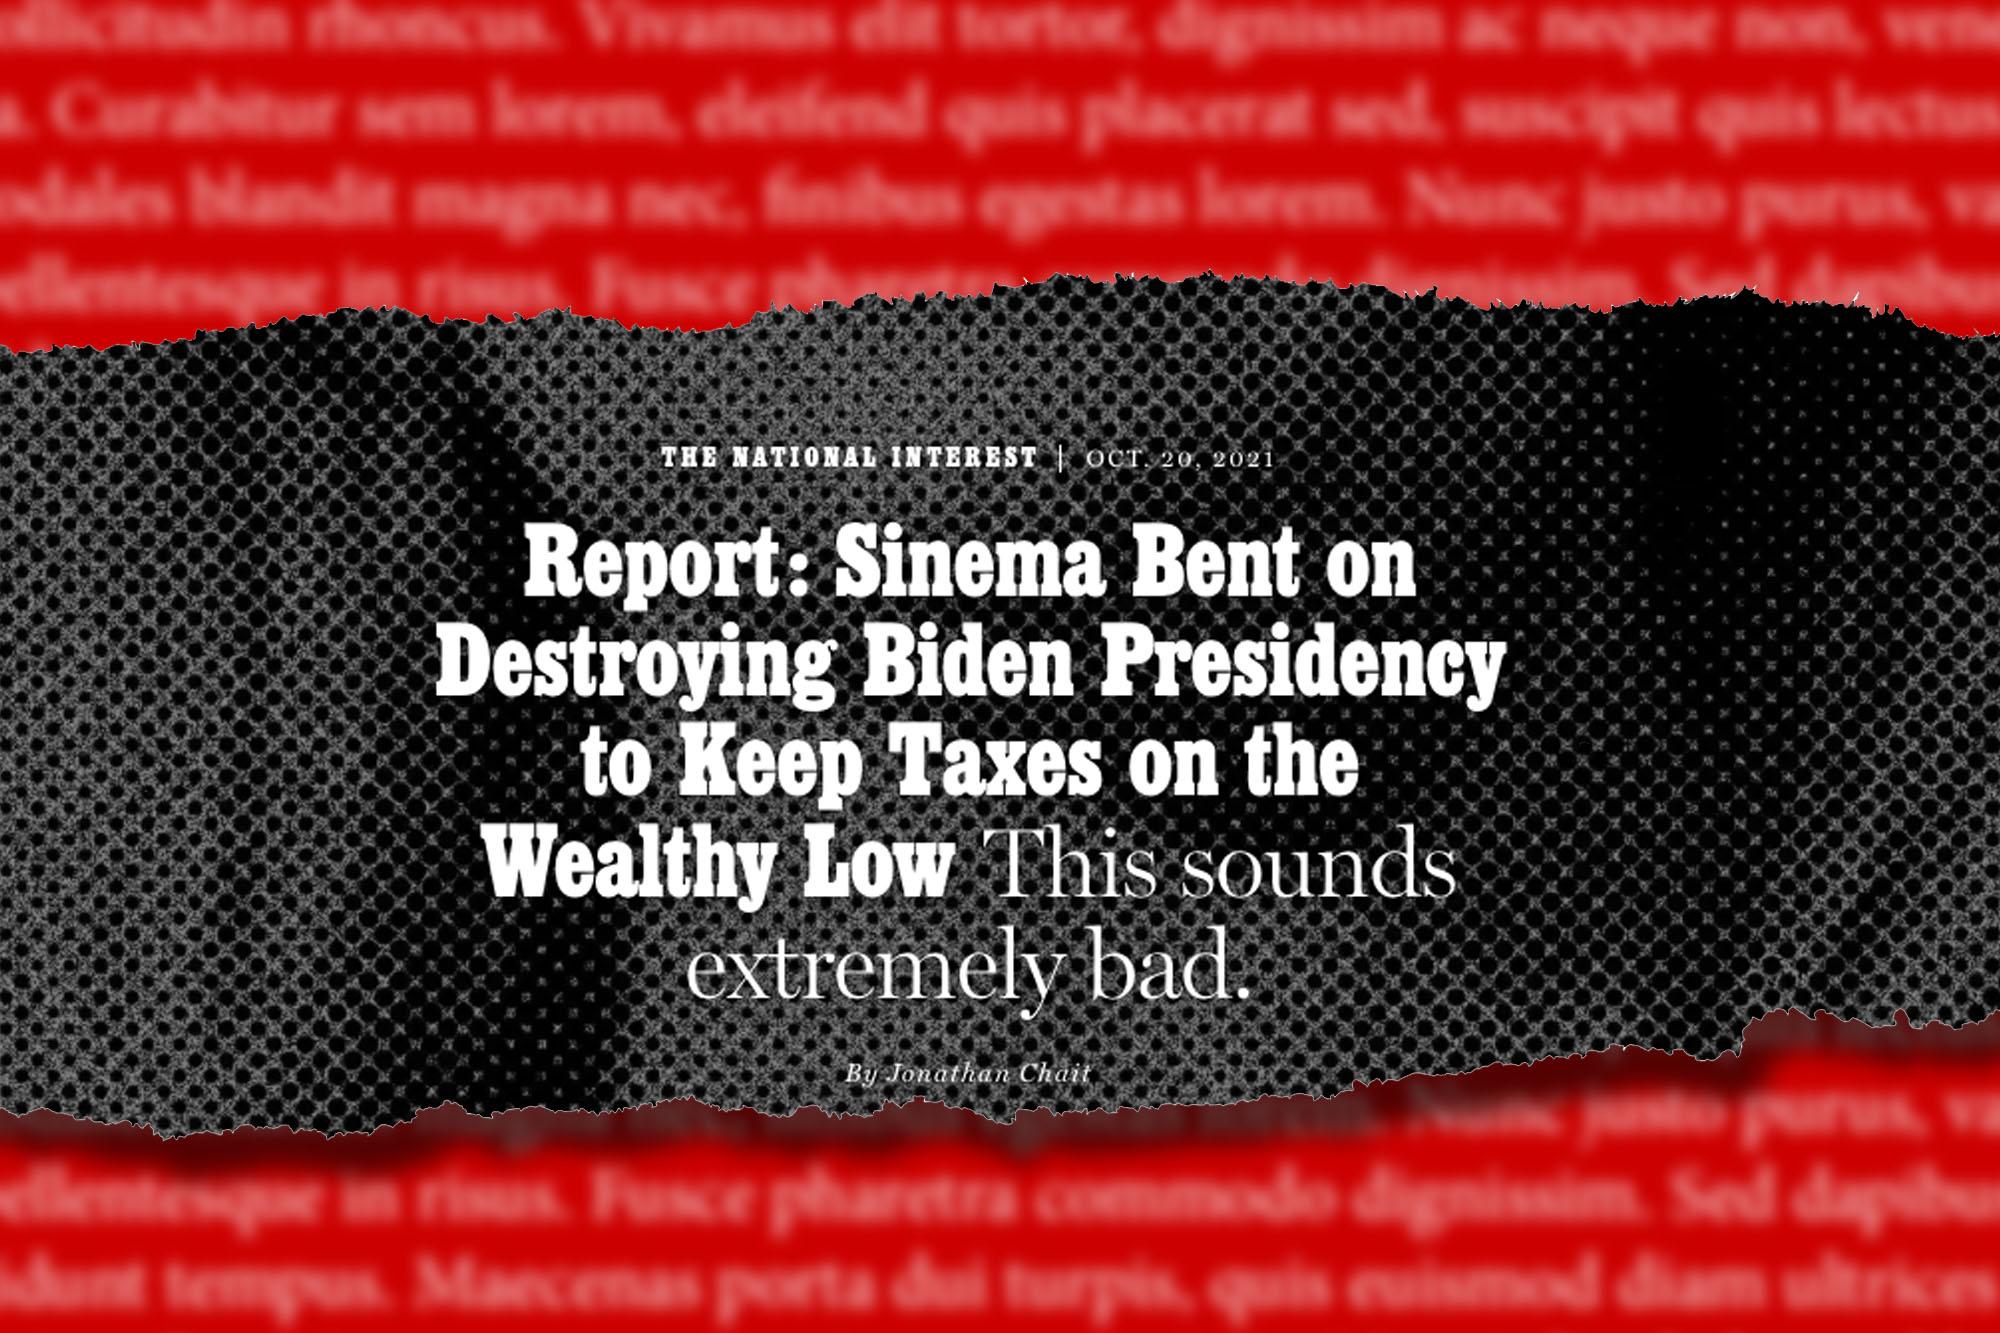 A headline from a New York magazine article on Sen. Kyrsten Sinema and the Biden administration.